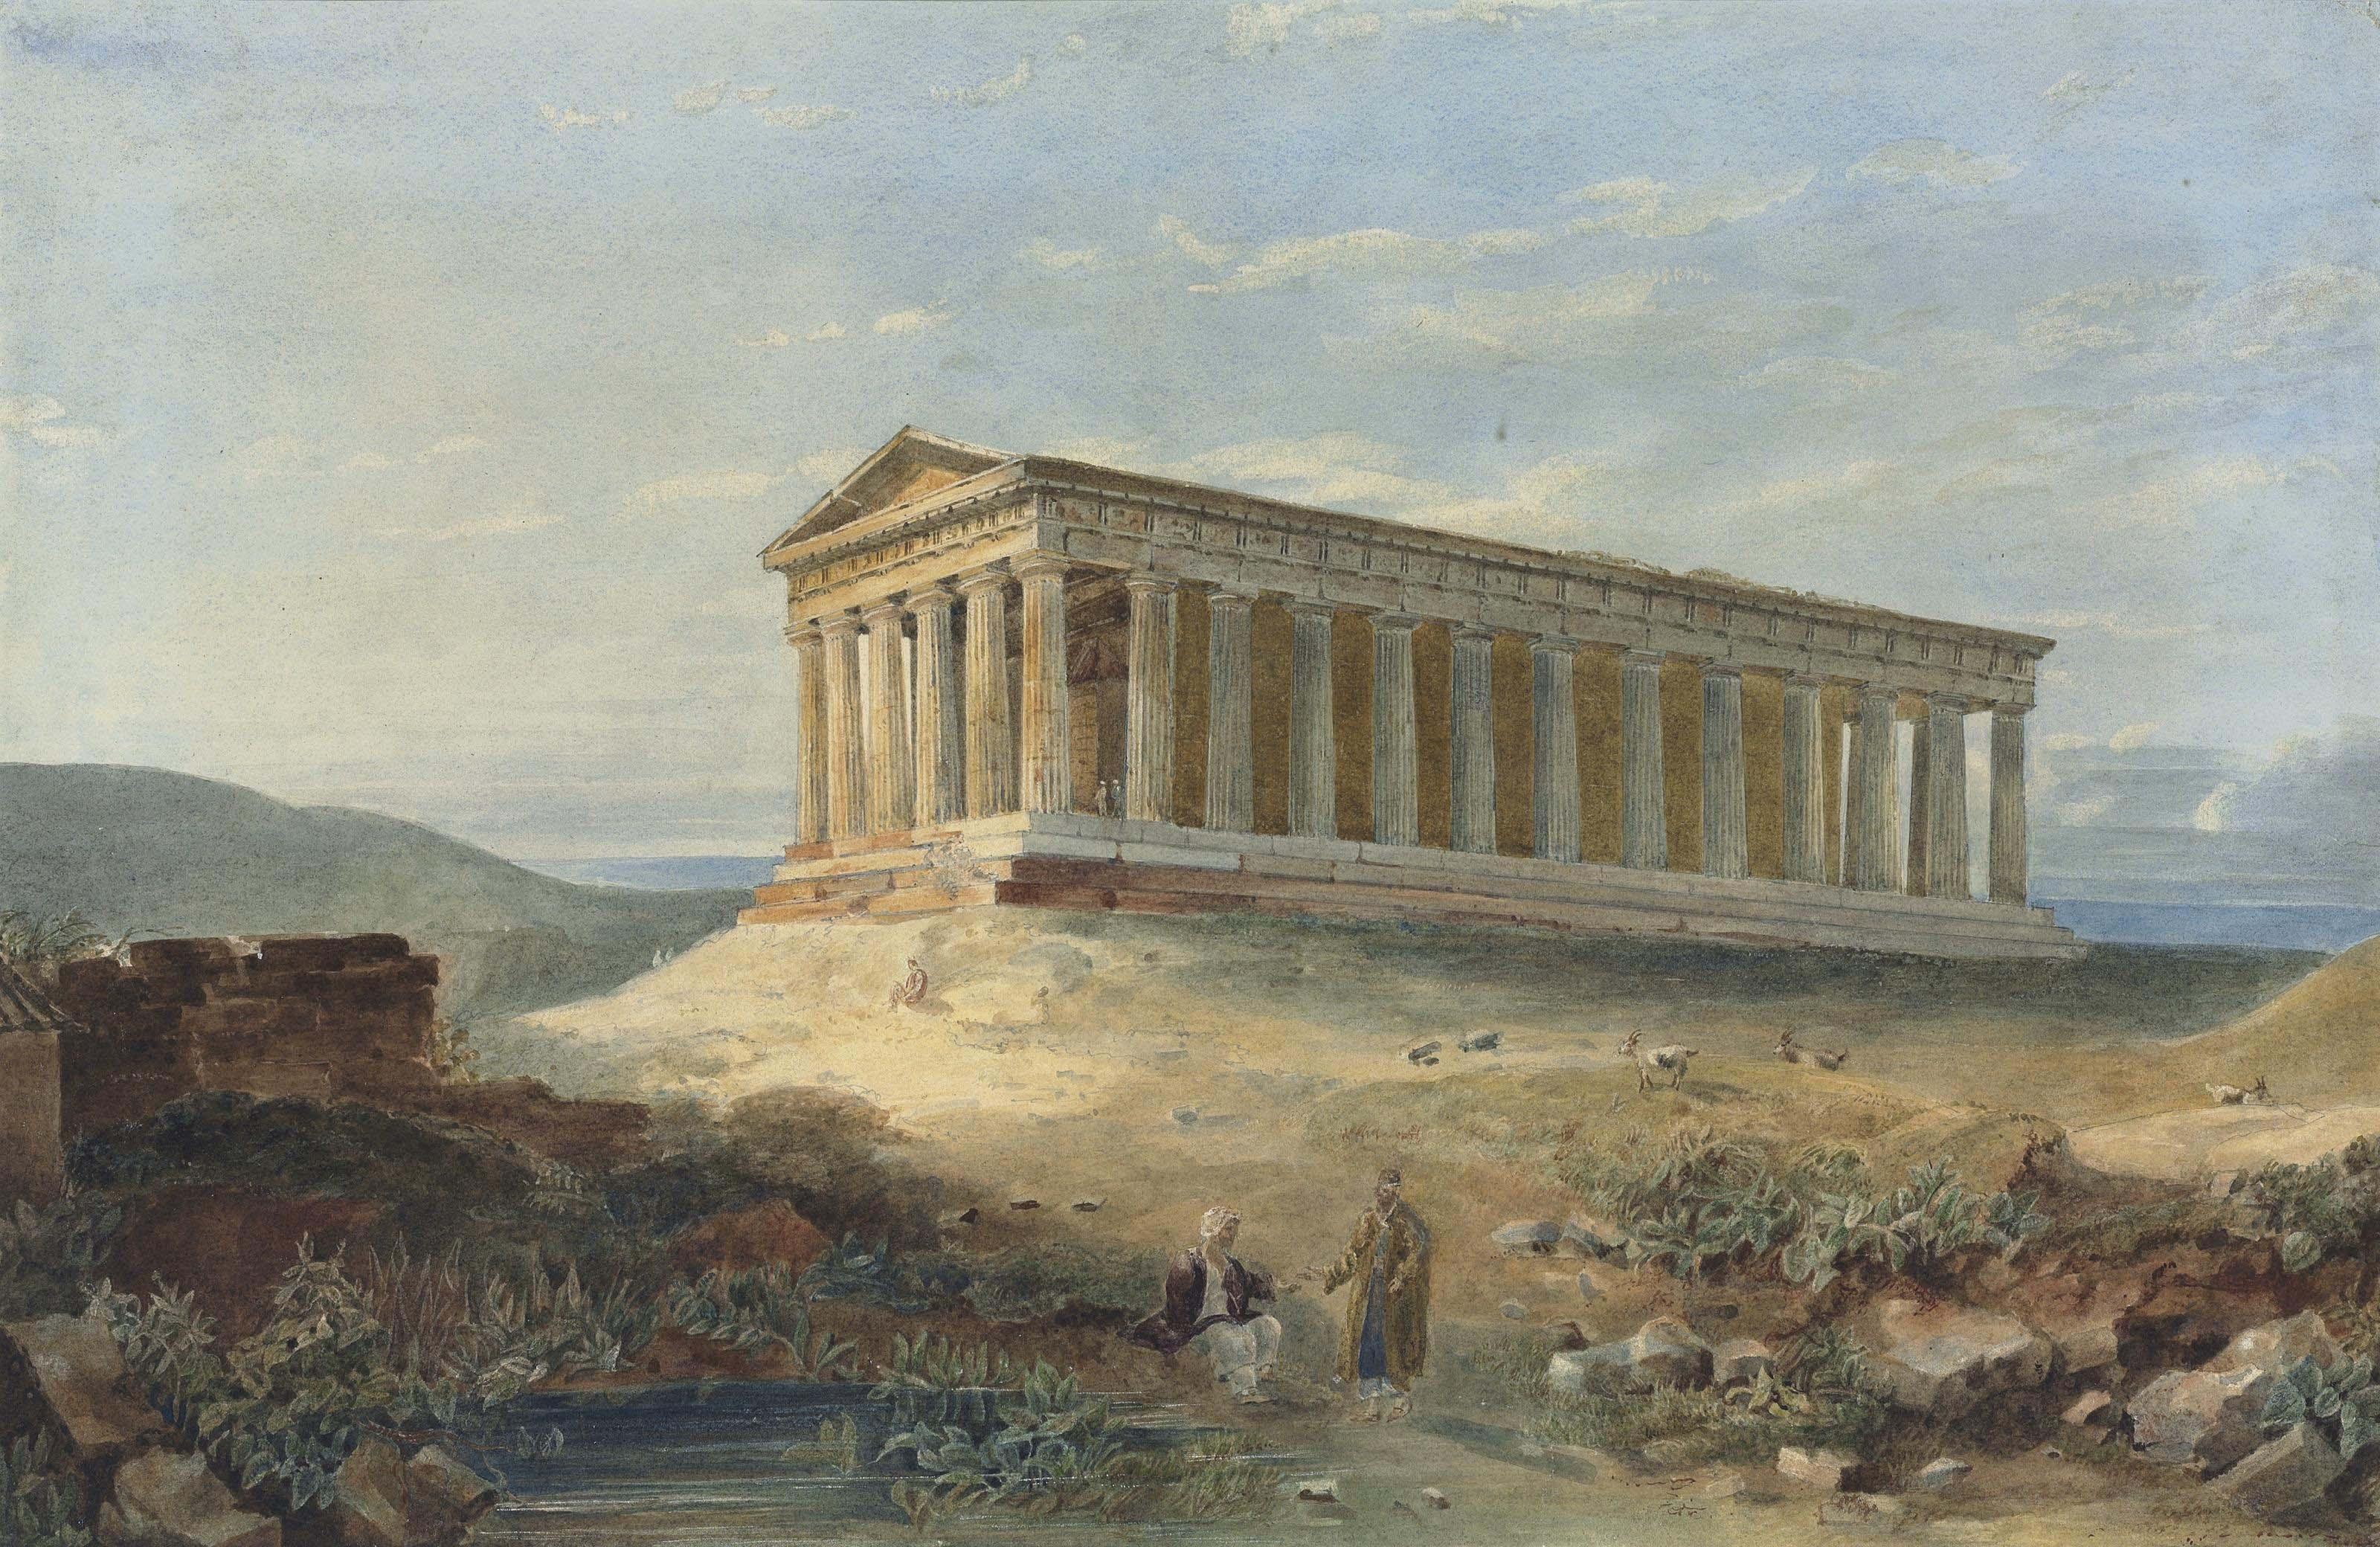 Hugh William 'Grecian' Williams (?Devon 1773-1829 Edinburgh)